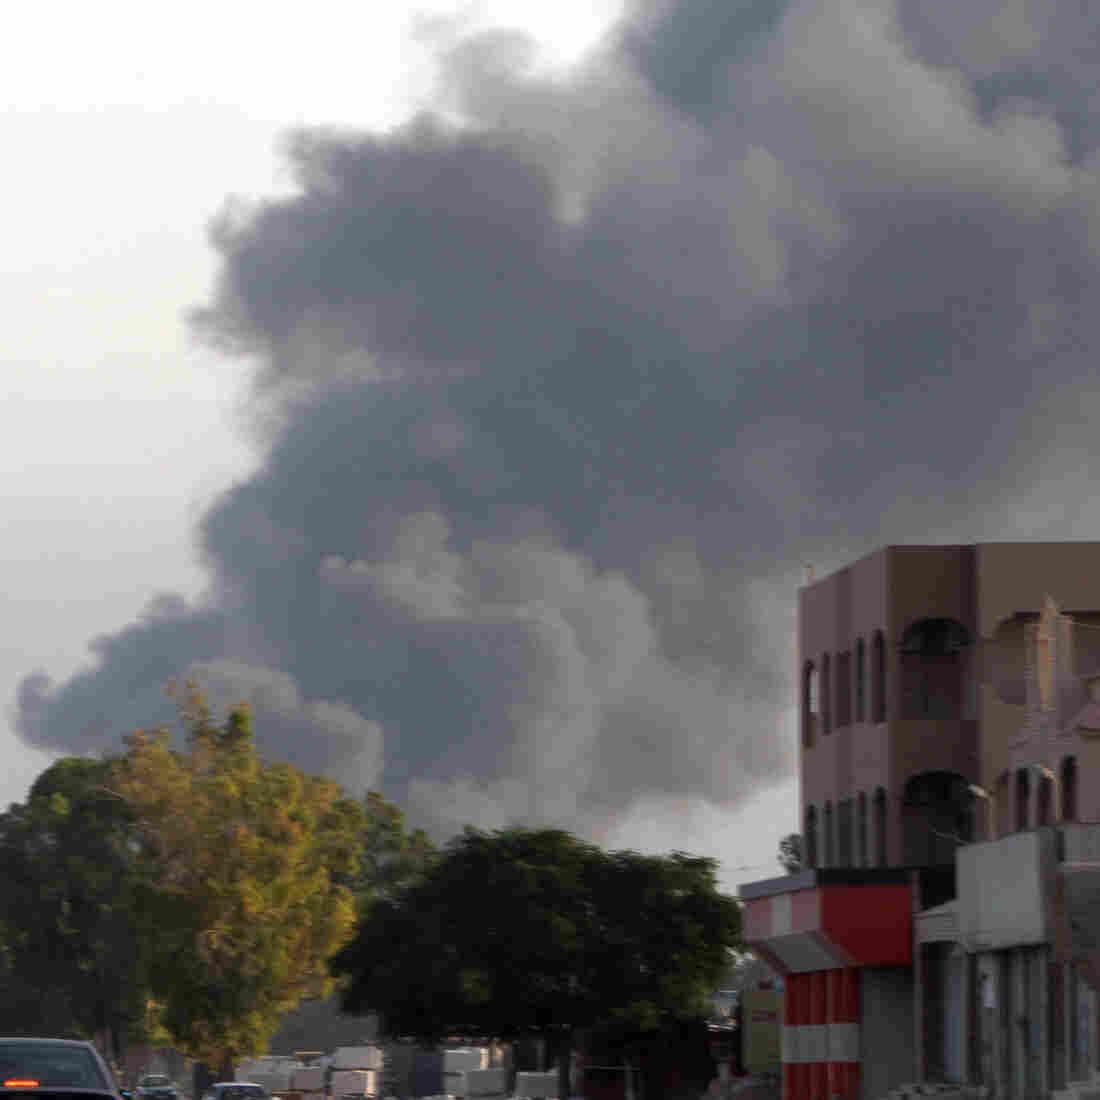 U.S. Embassy Compound In Libya Shut Down Amid Fighting